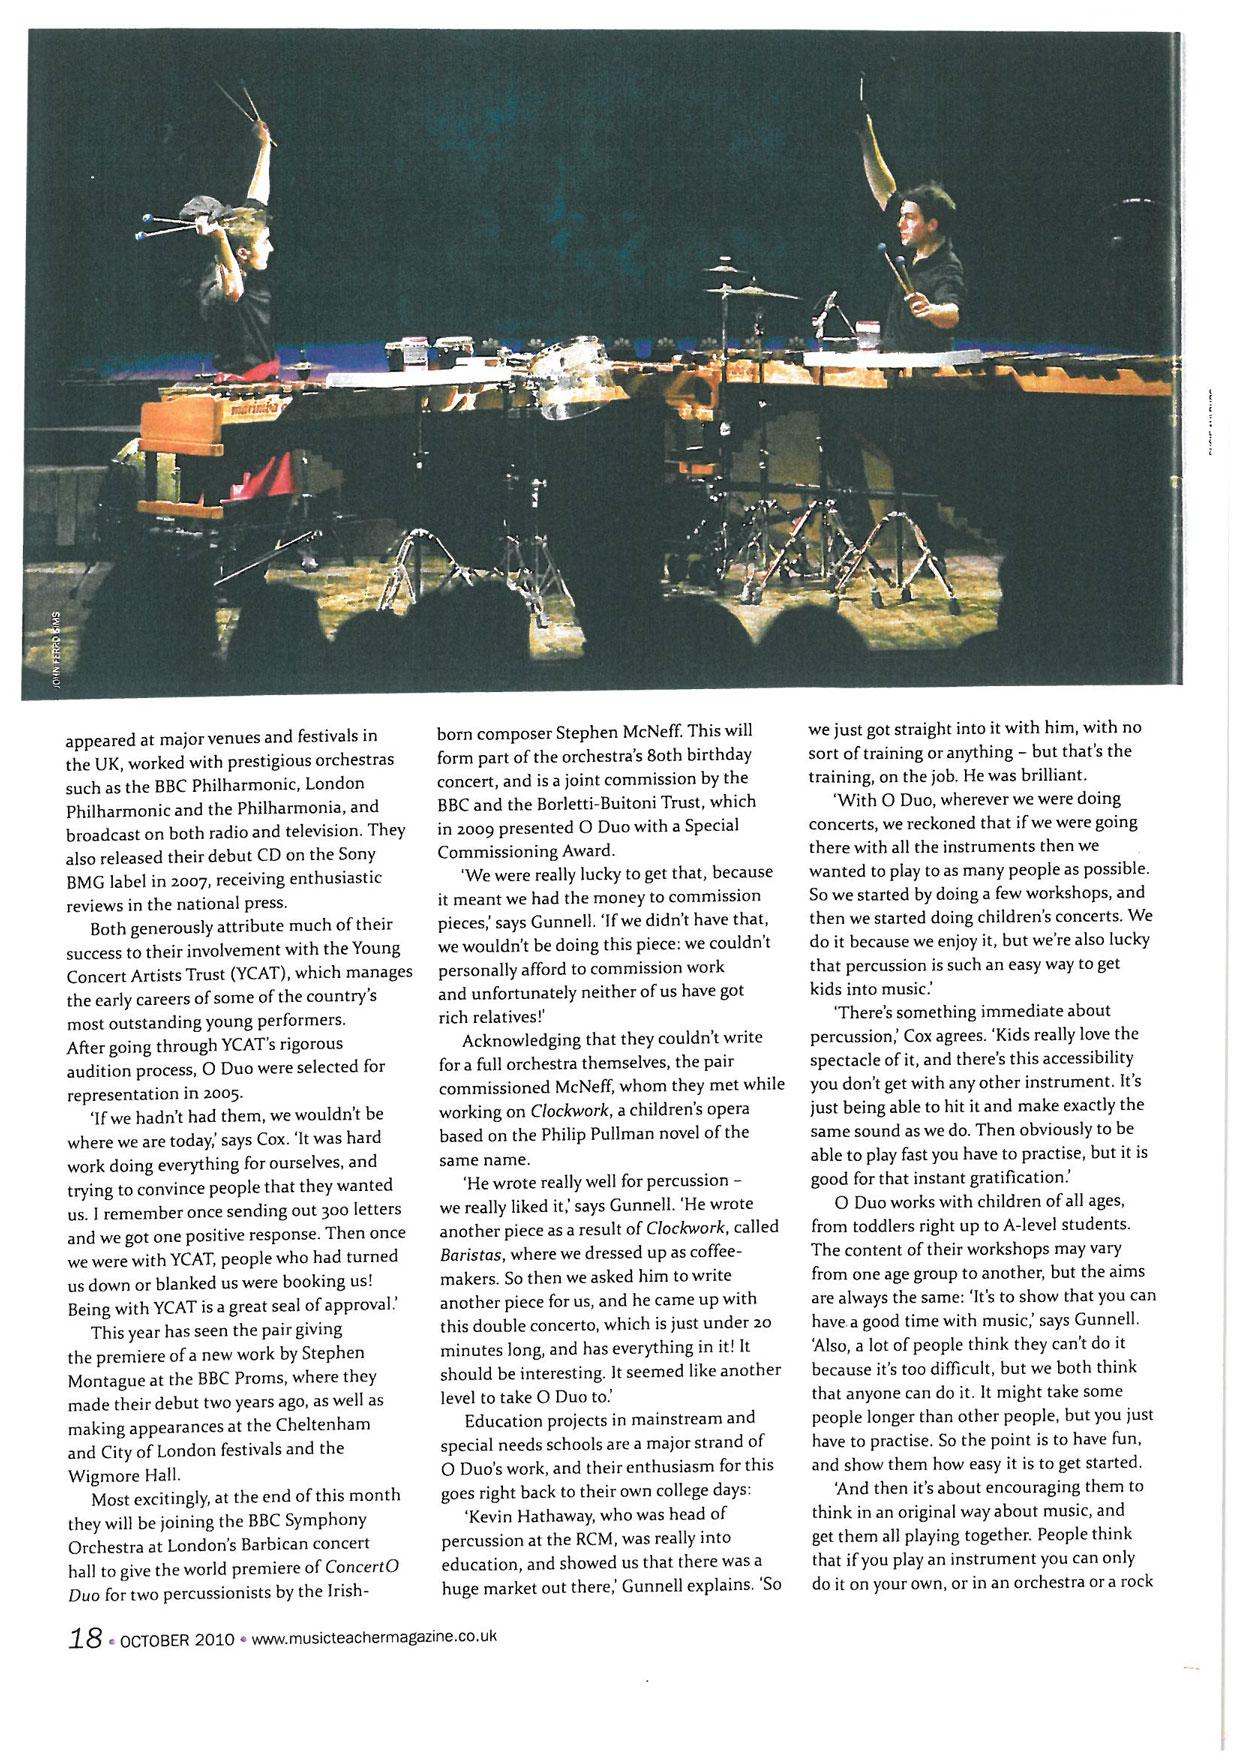 Article, 2010, Music Teacher Magazine, p2